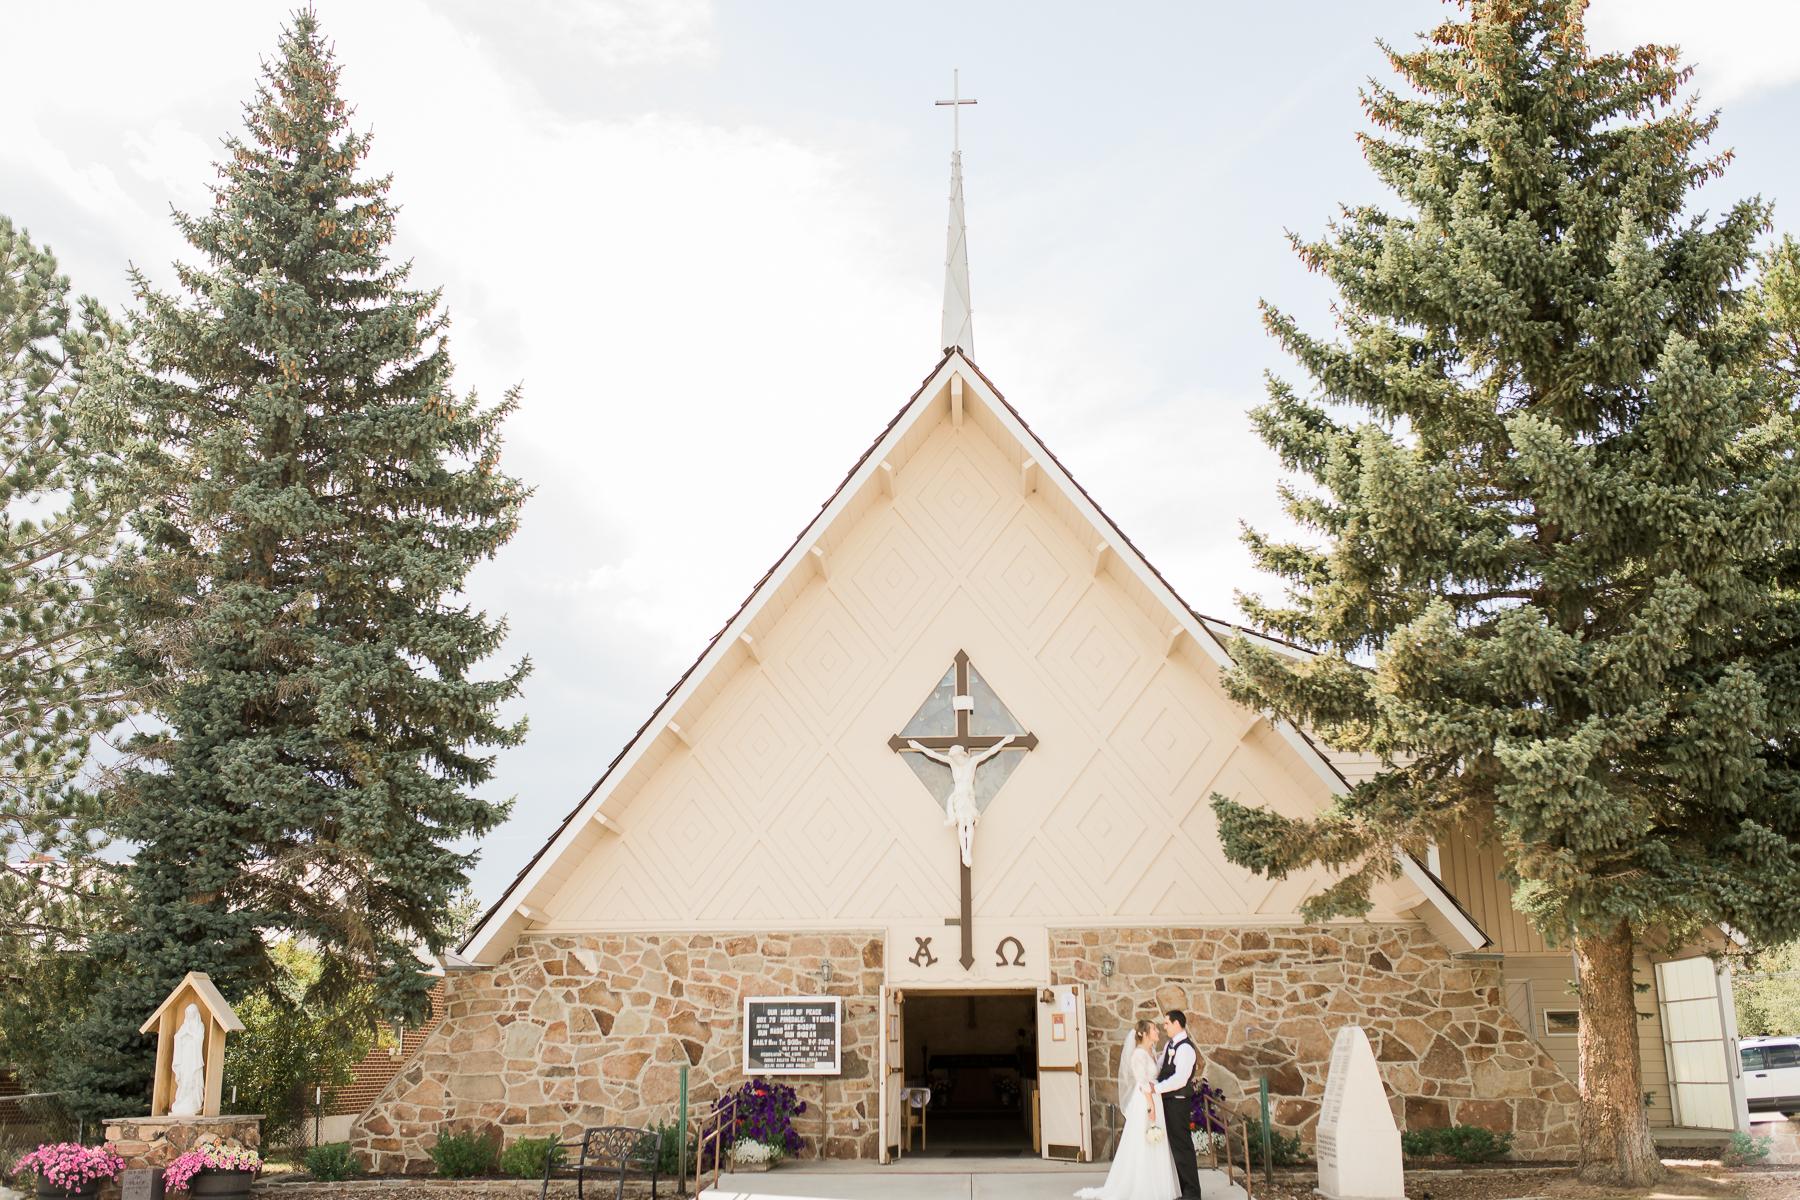 Wyoming chapel wedding by Laramie based photographer, Megan Lee Photography